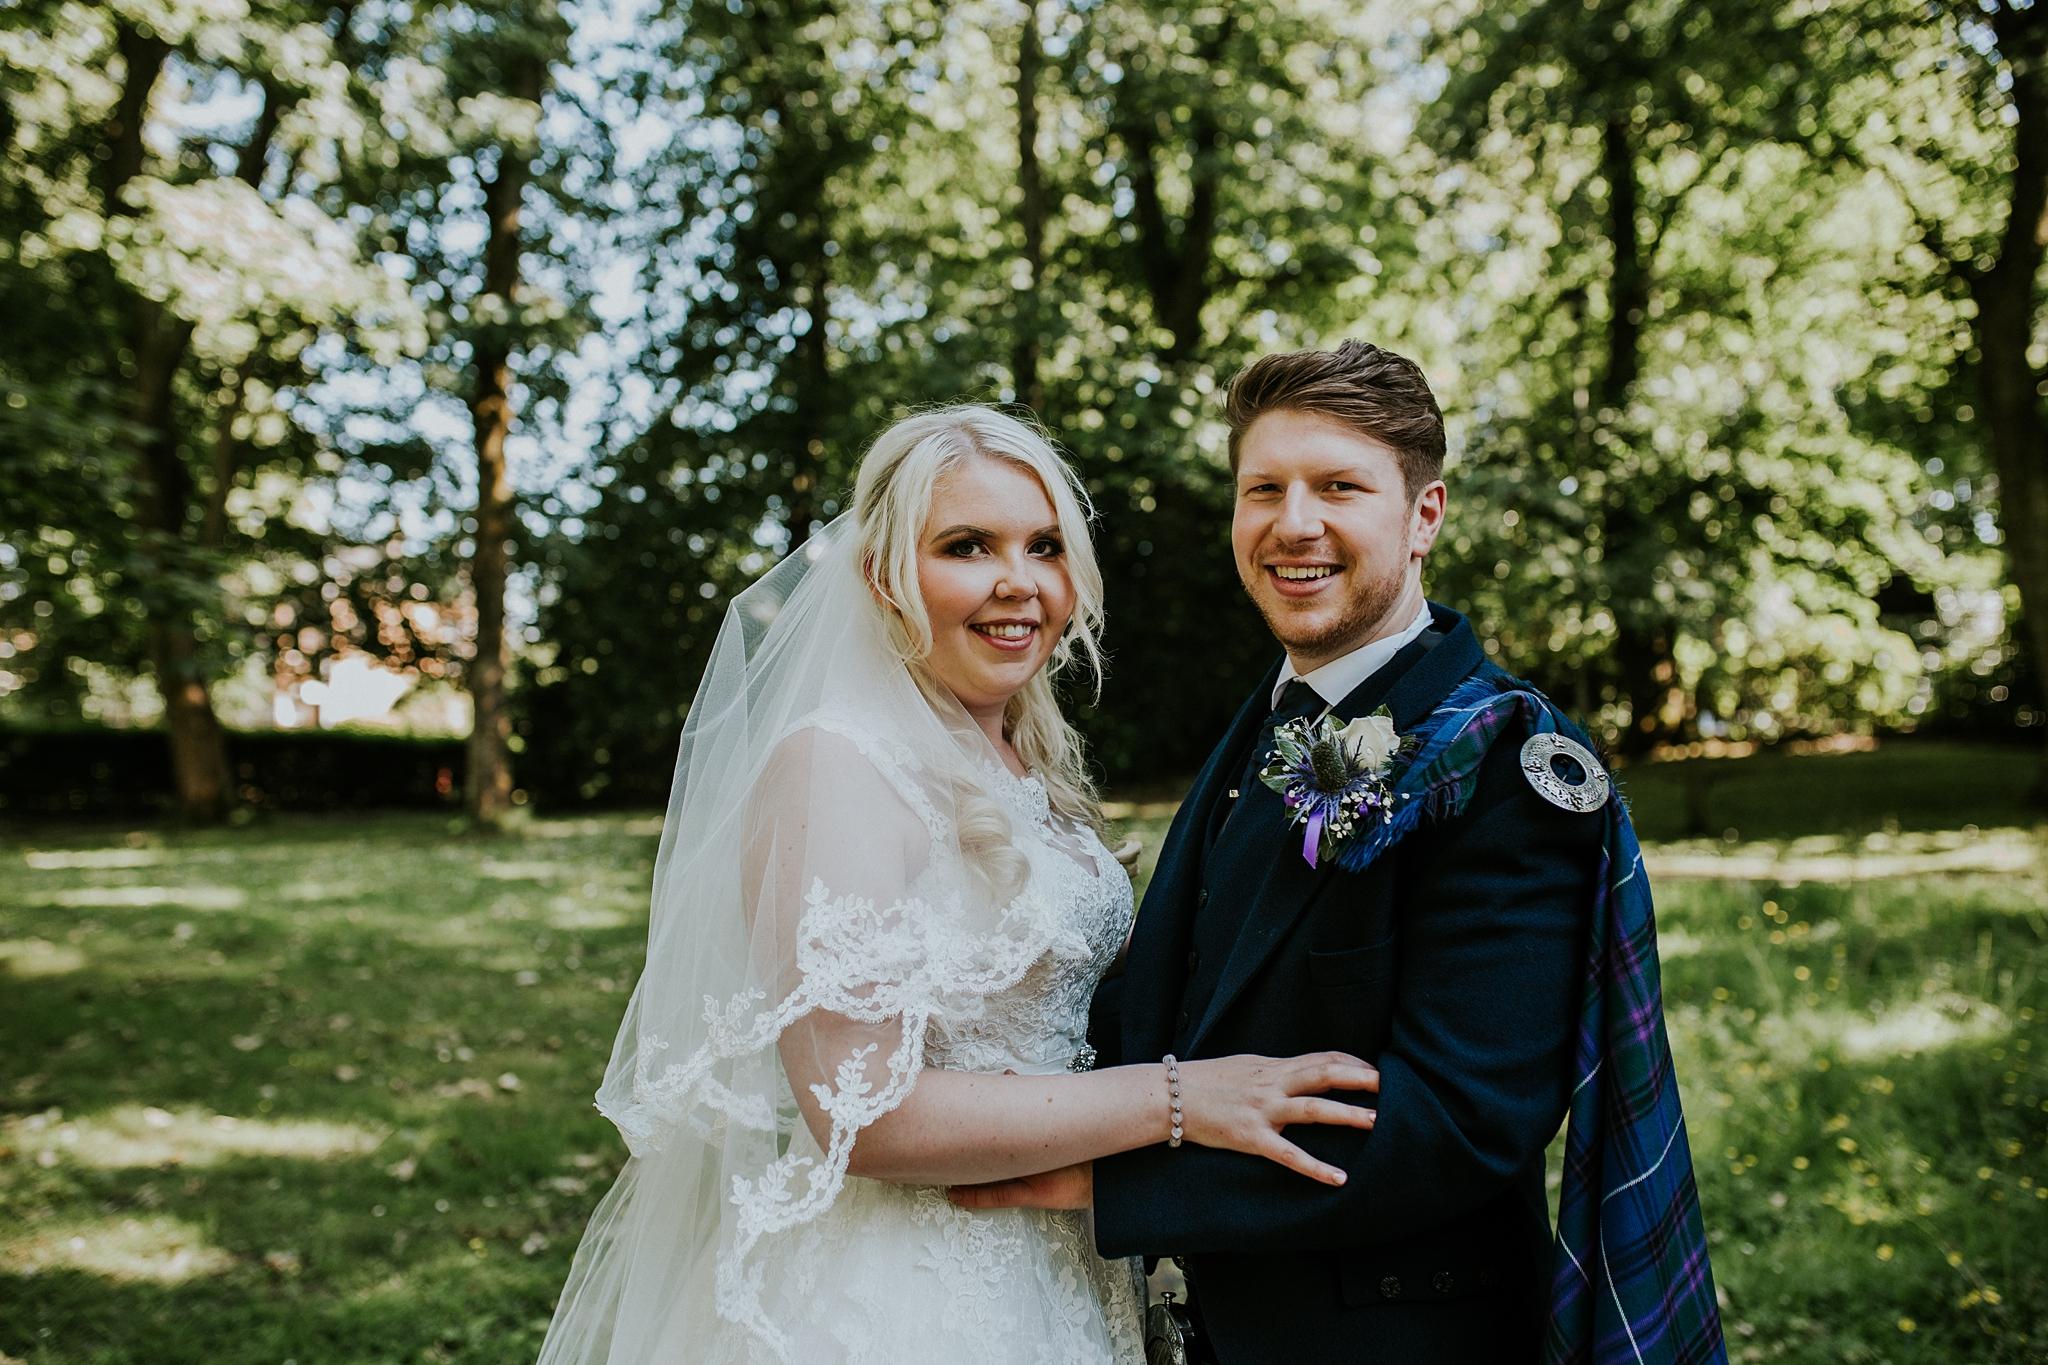 Mark_Alison_Pollockshields_Burgh_Hall_Wedding-26.JPG